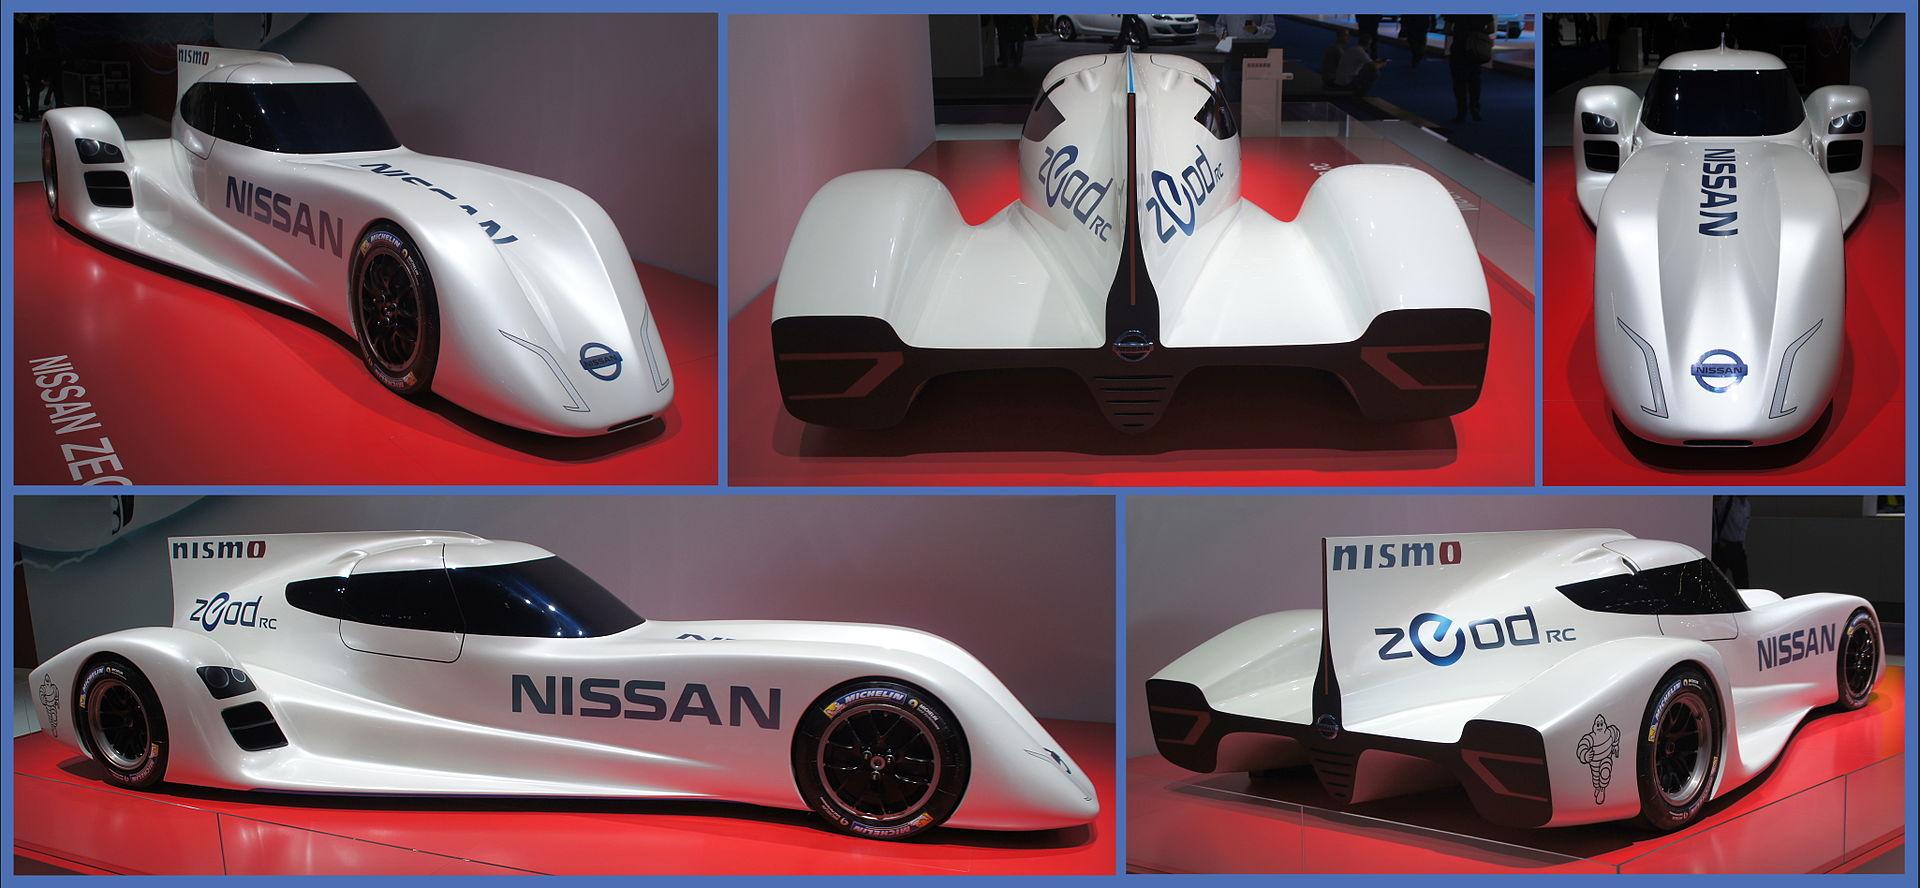 Nissan ZEOD RC - Wikipedia